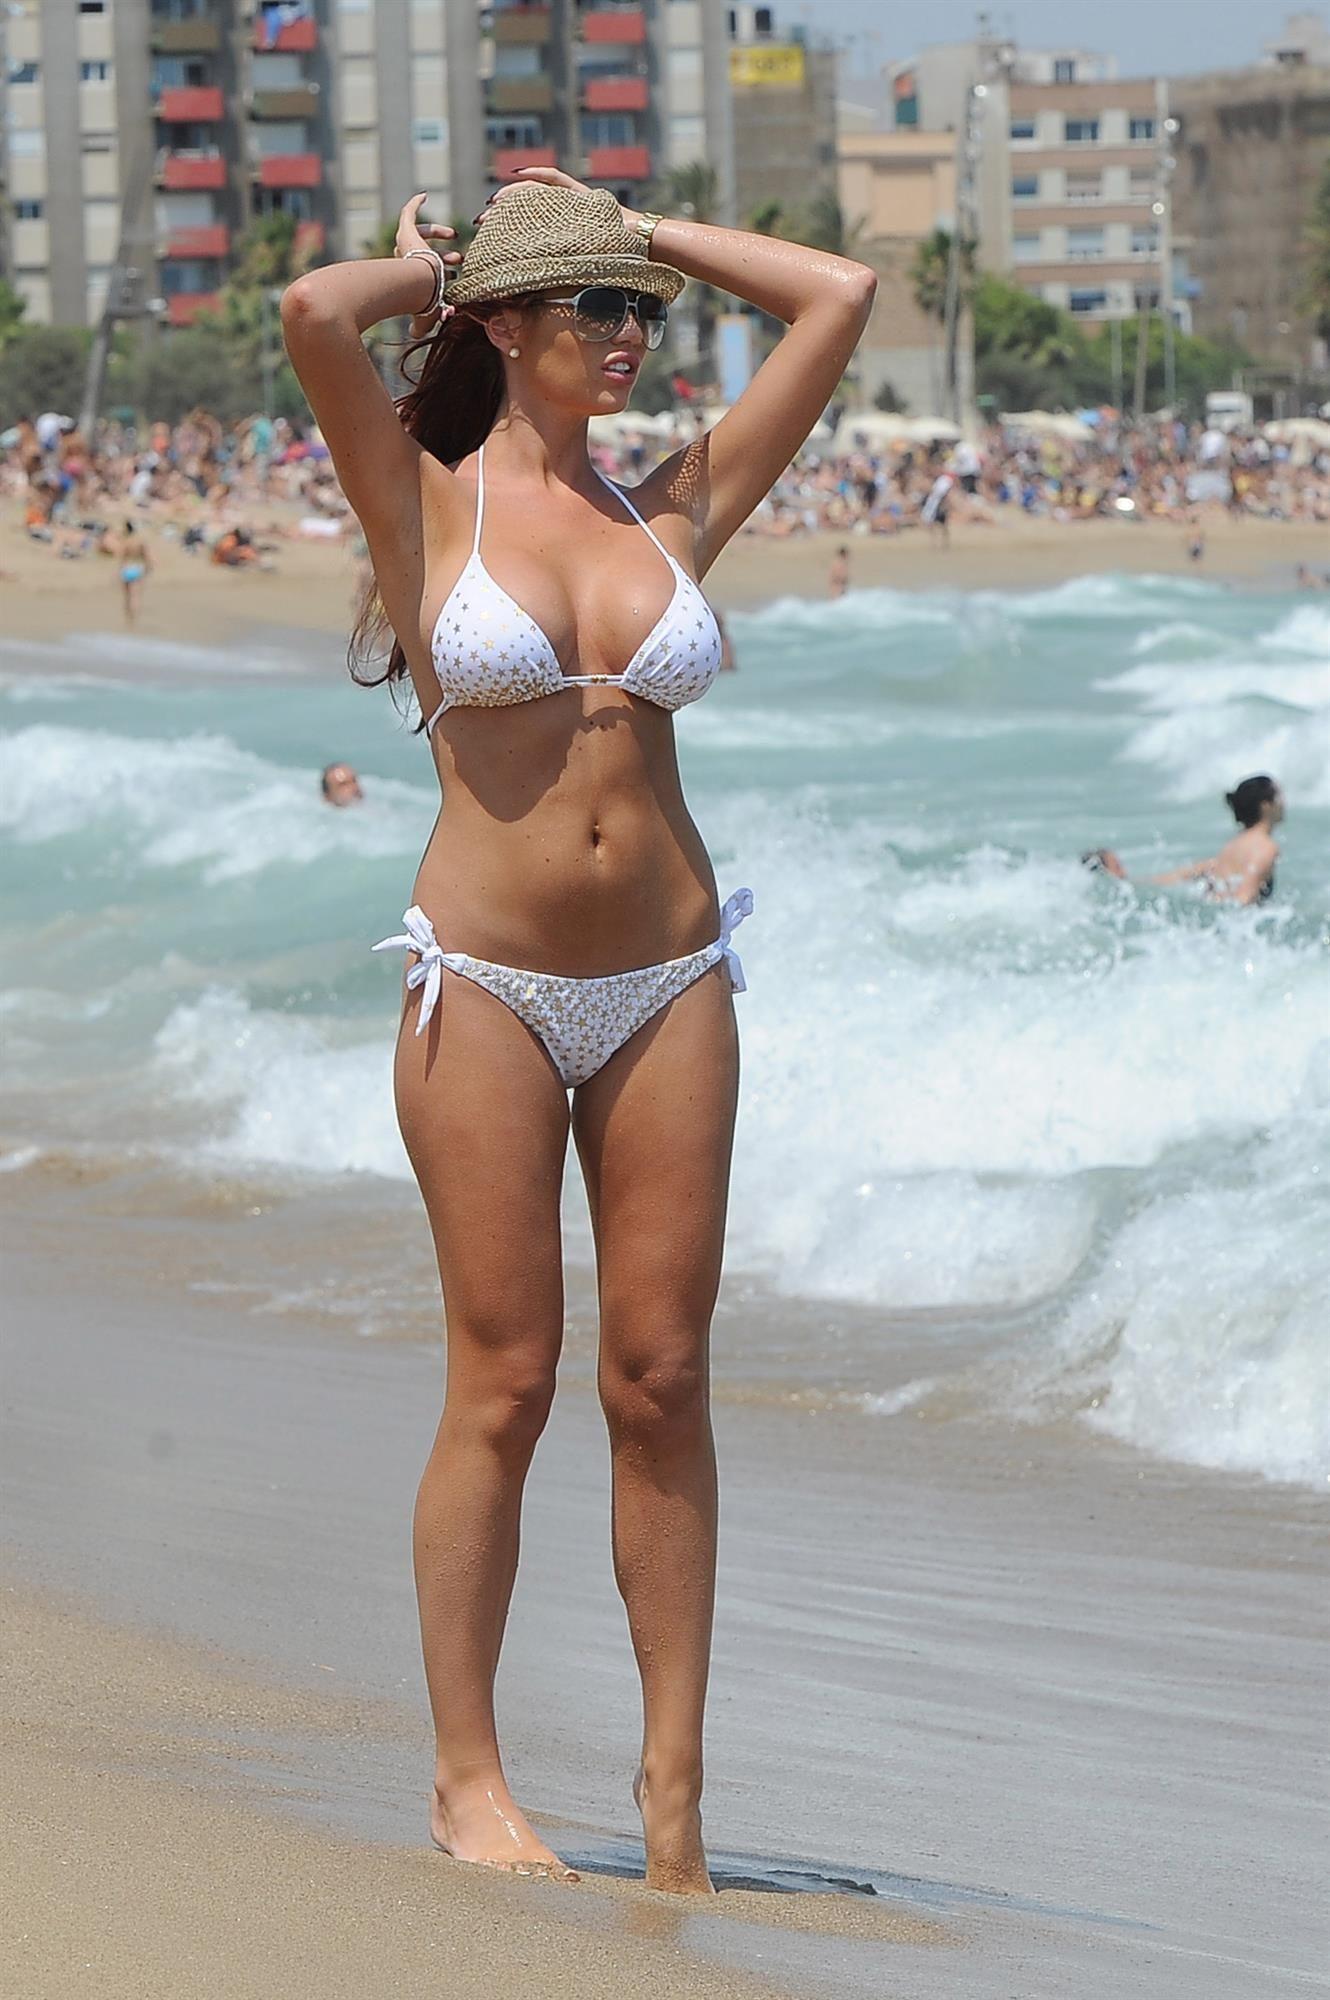 Bikini Amy Childs nudes (66 photos), Ass, Is a cute, Boobs, braless 2020